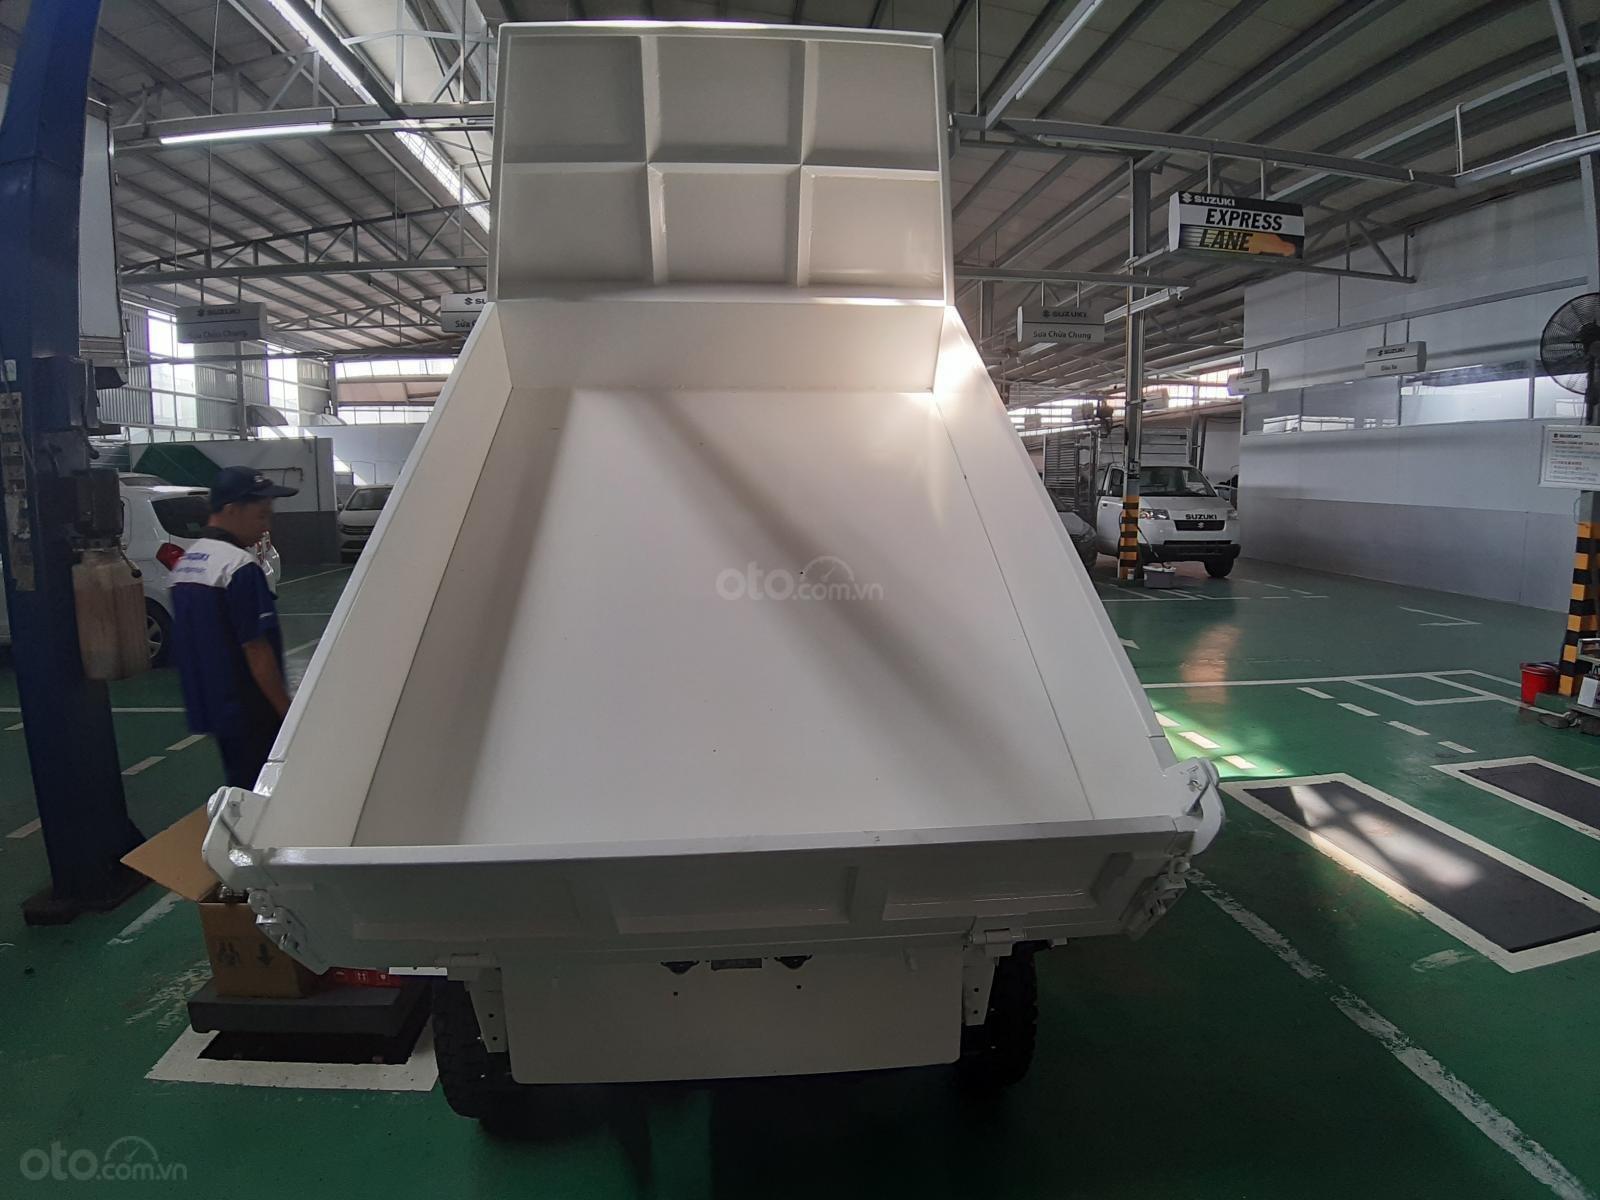 Xe tải Suzuki Ben giá hạt dẻ (3)